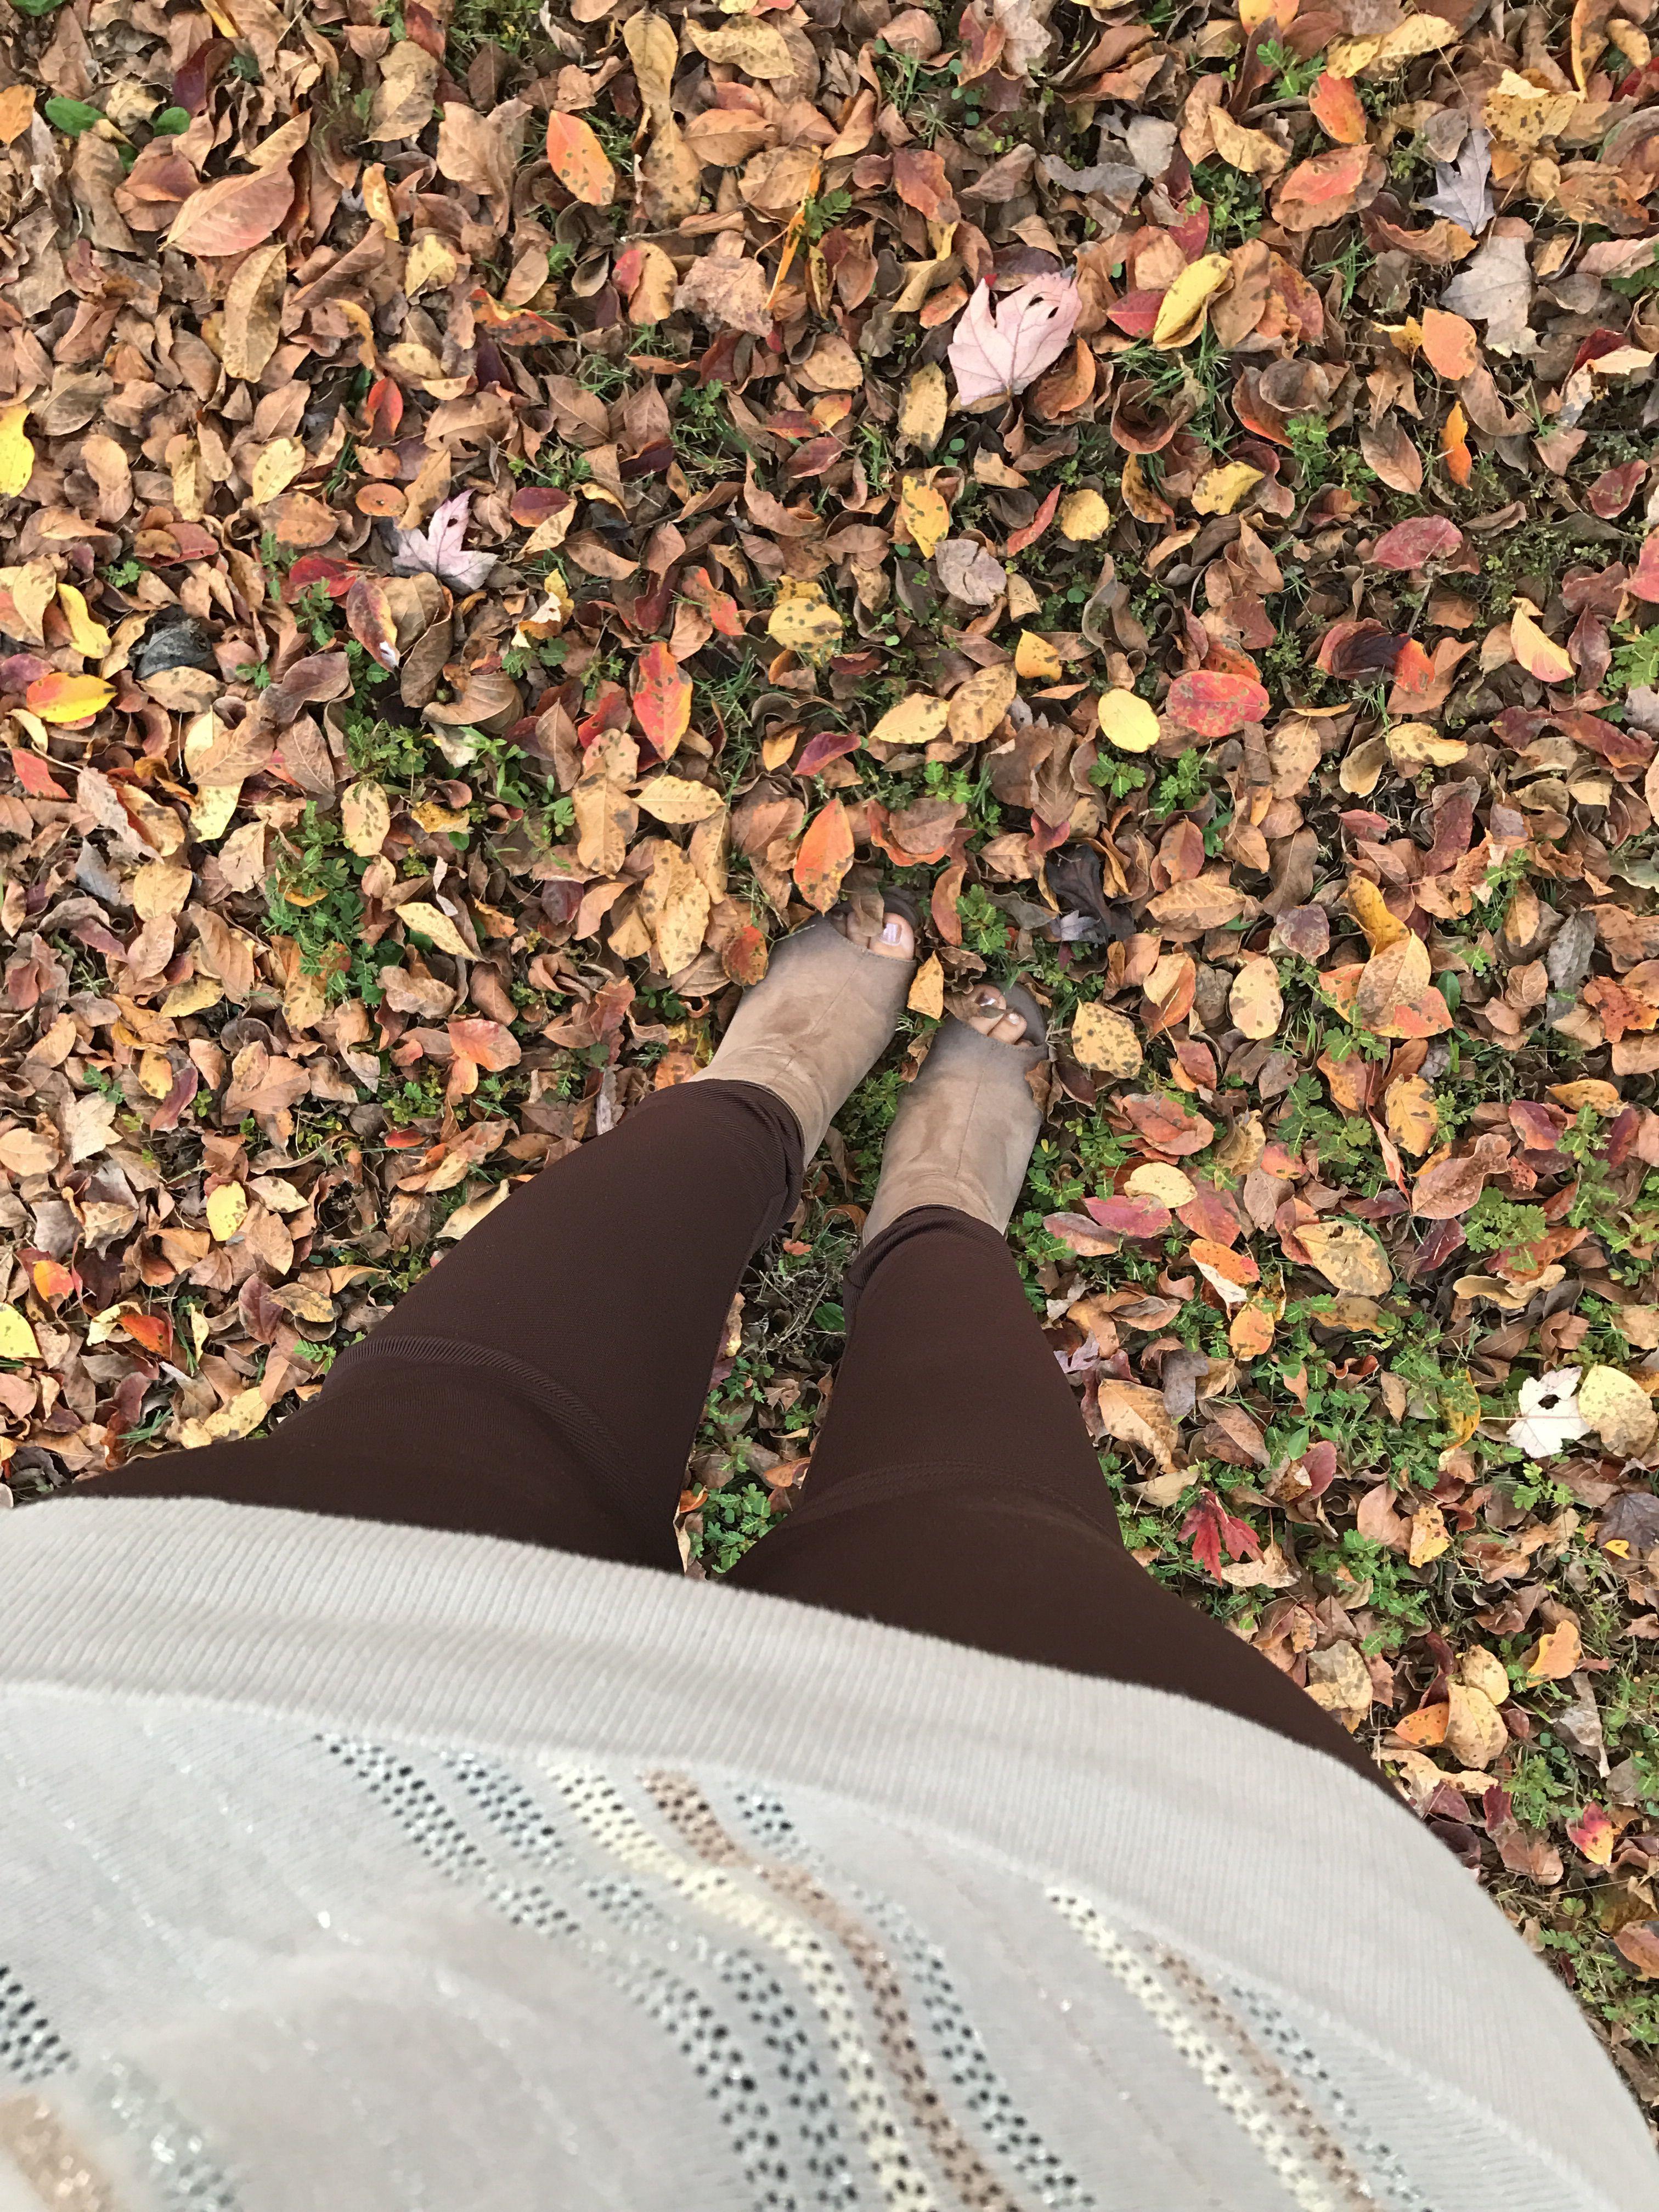 Fall fashion #booties #heelslover #fallfashion #fallcolors #fallstyle